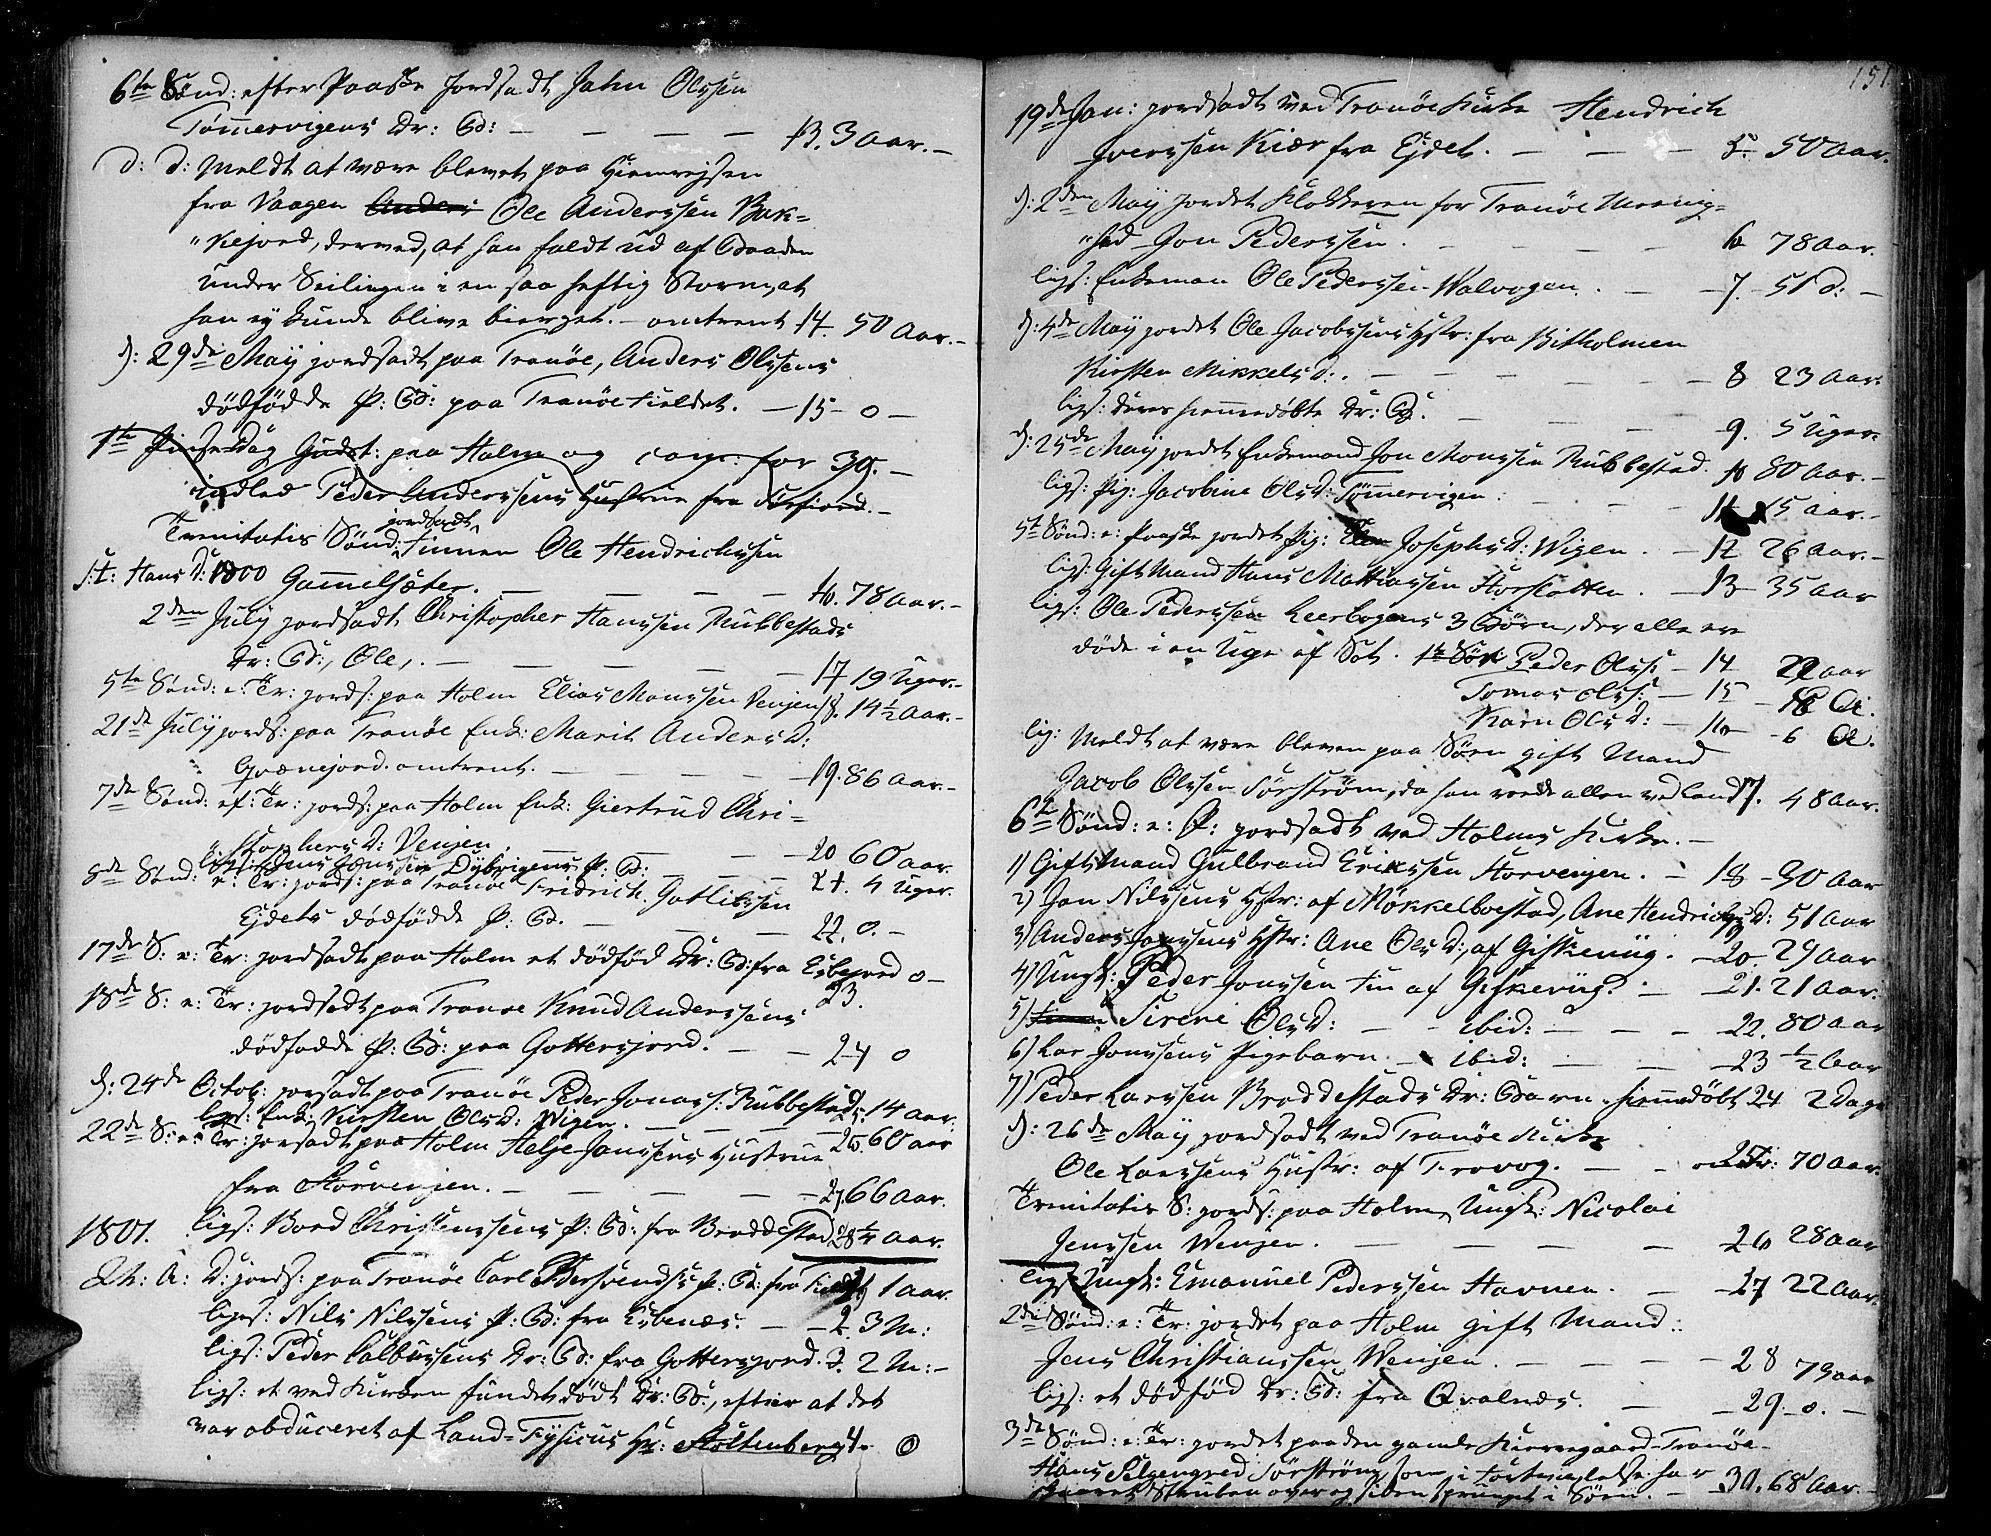 SATØ, Tranøy sokneprestkontor, I/Ia/Iaa/L0002kirke: Ministerialbok nr. 2, 1773-1806, s. 151